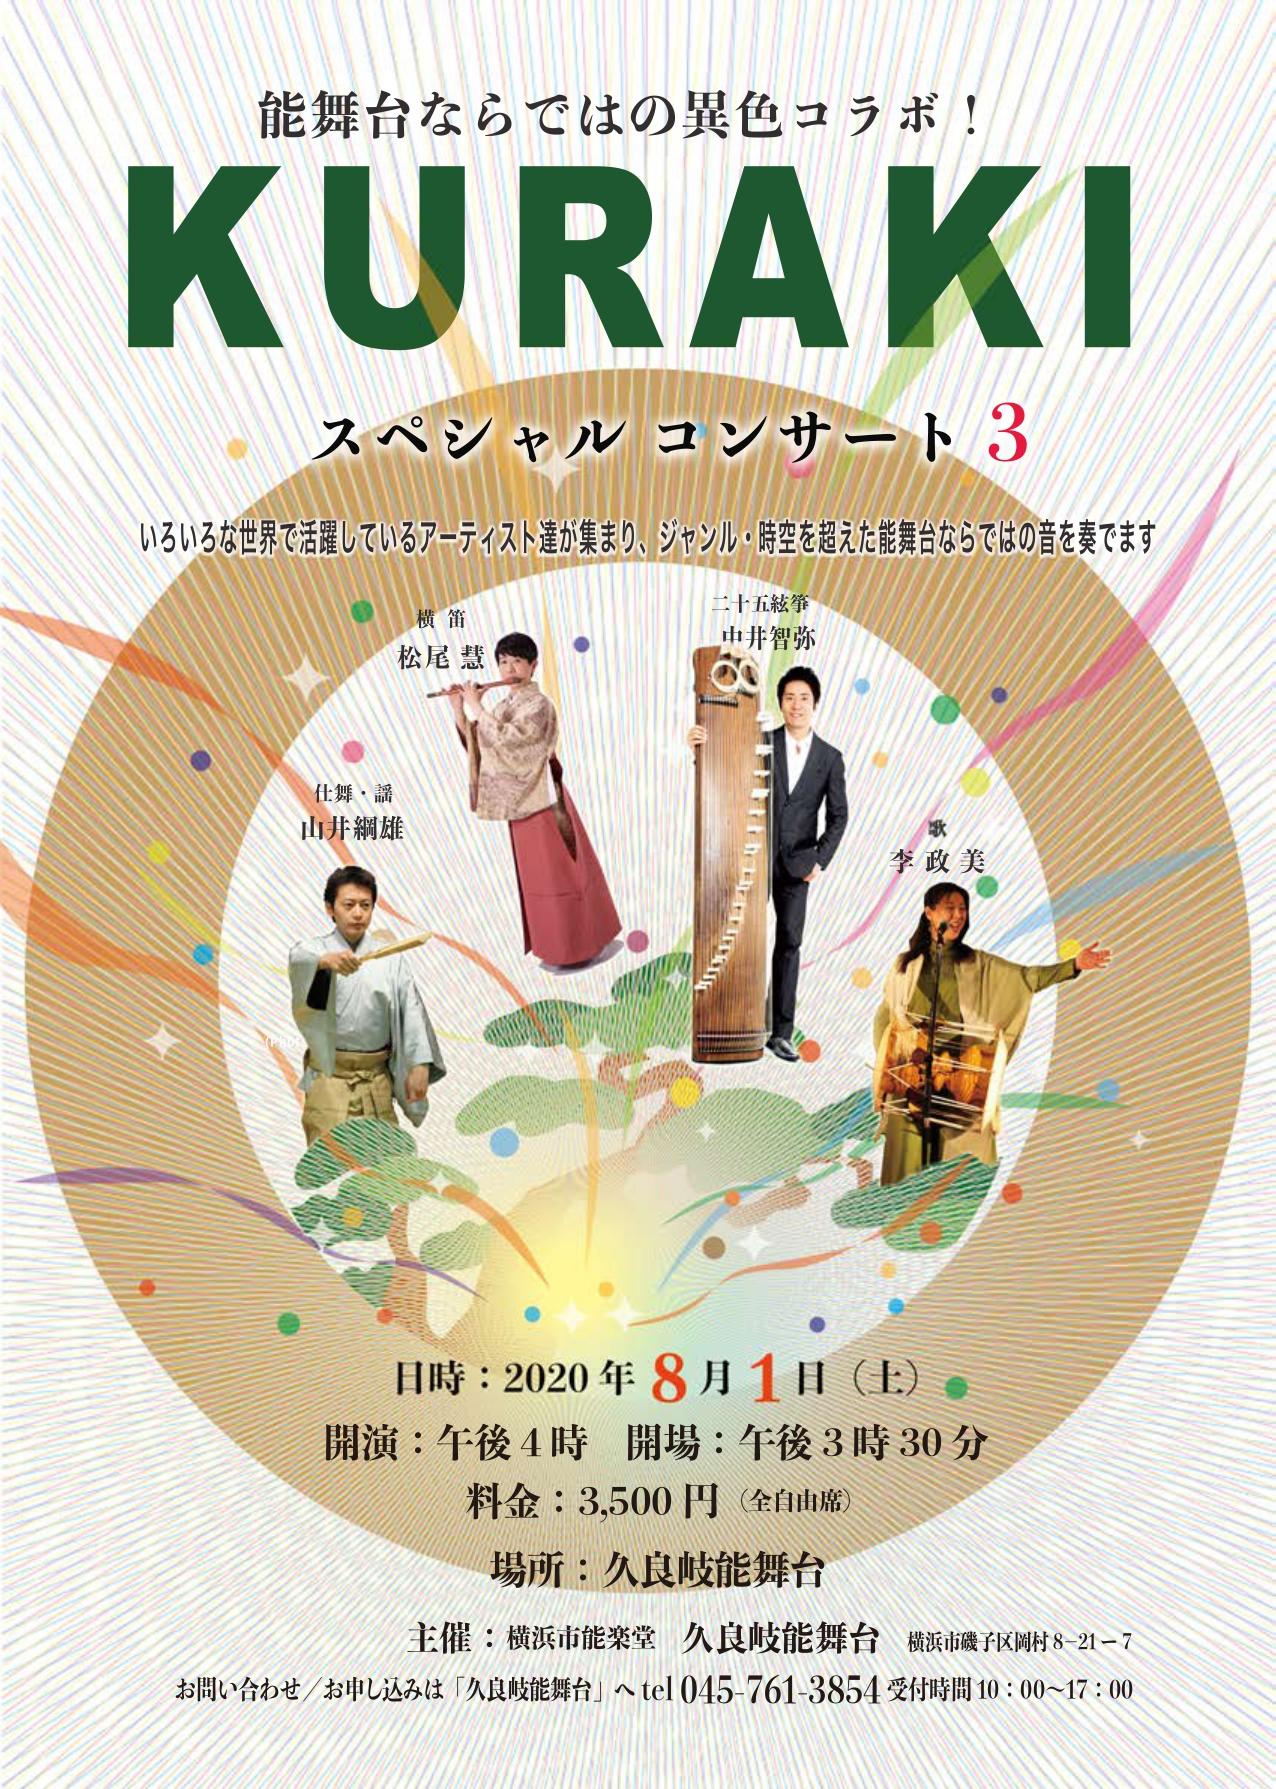 KURAKIスペシャルコンサート Part 3